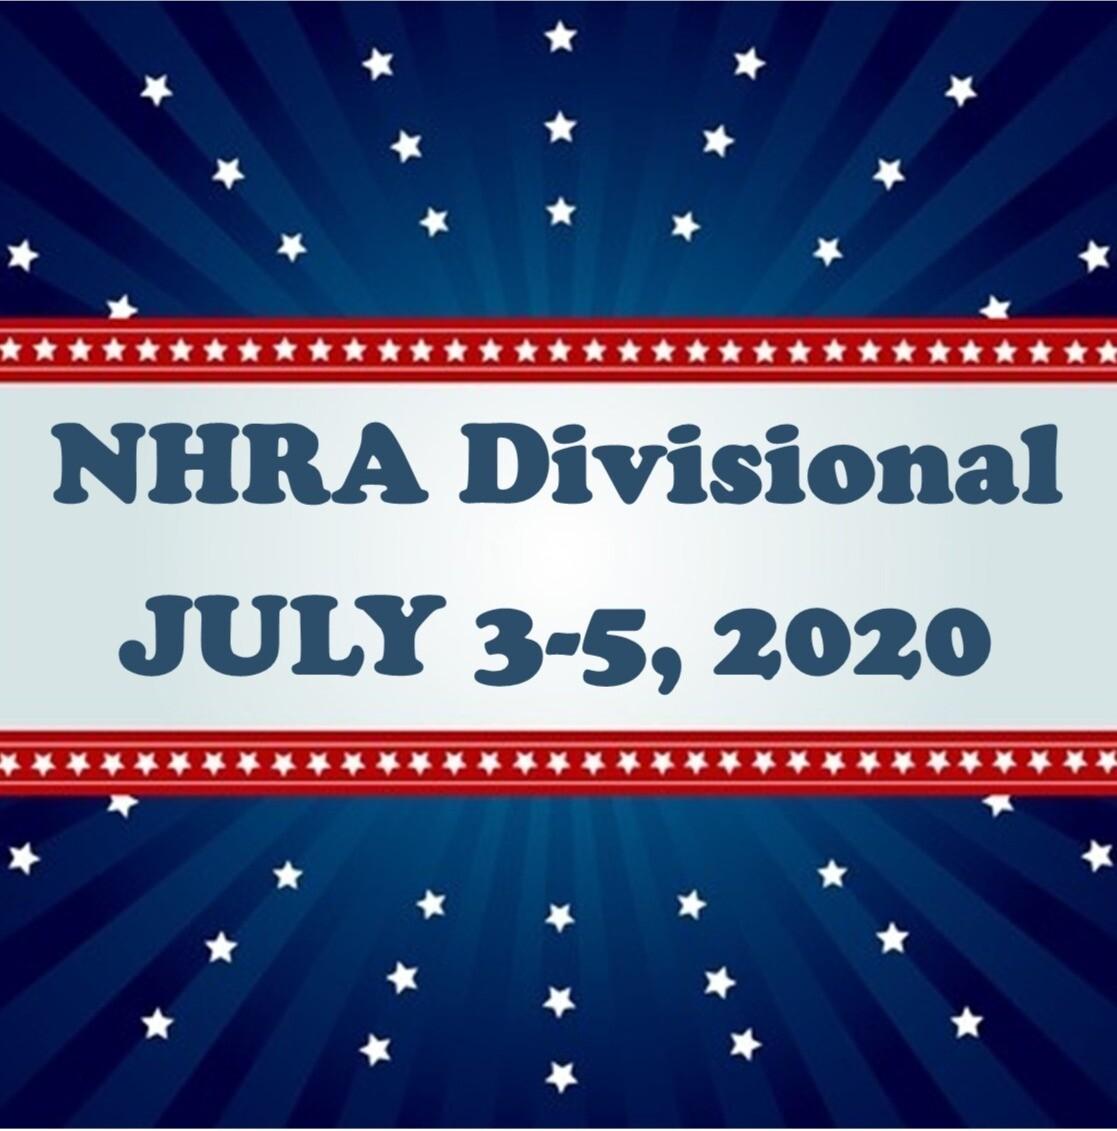 NHRA Divisional July 3-5, 2020